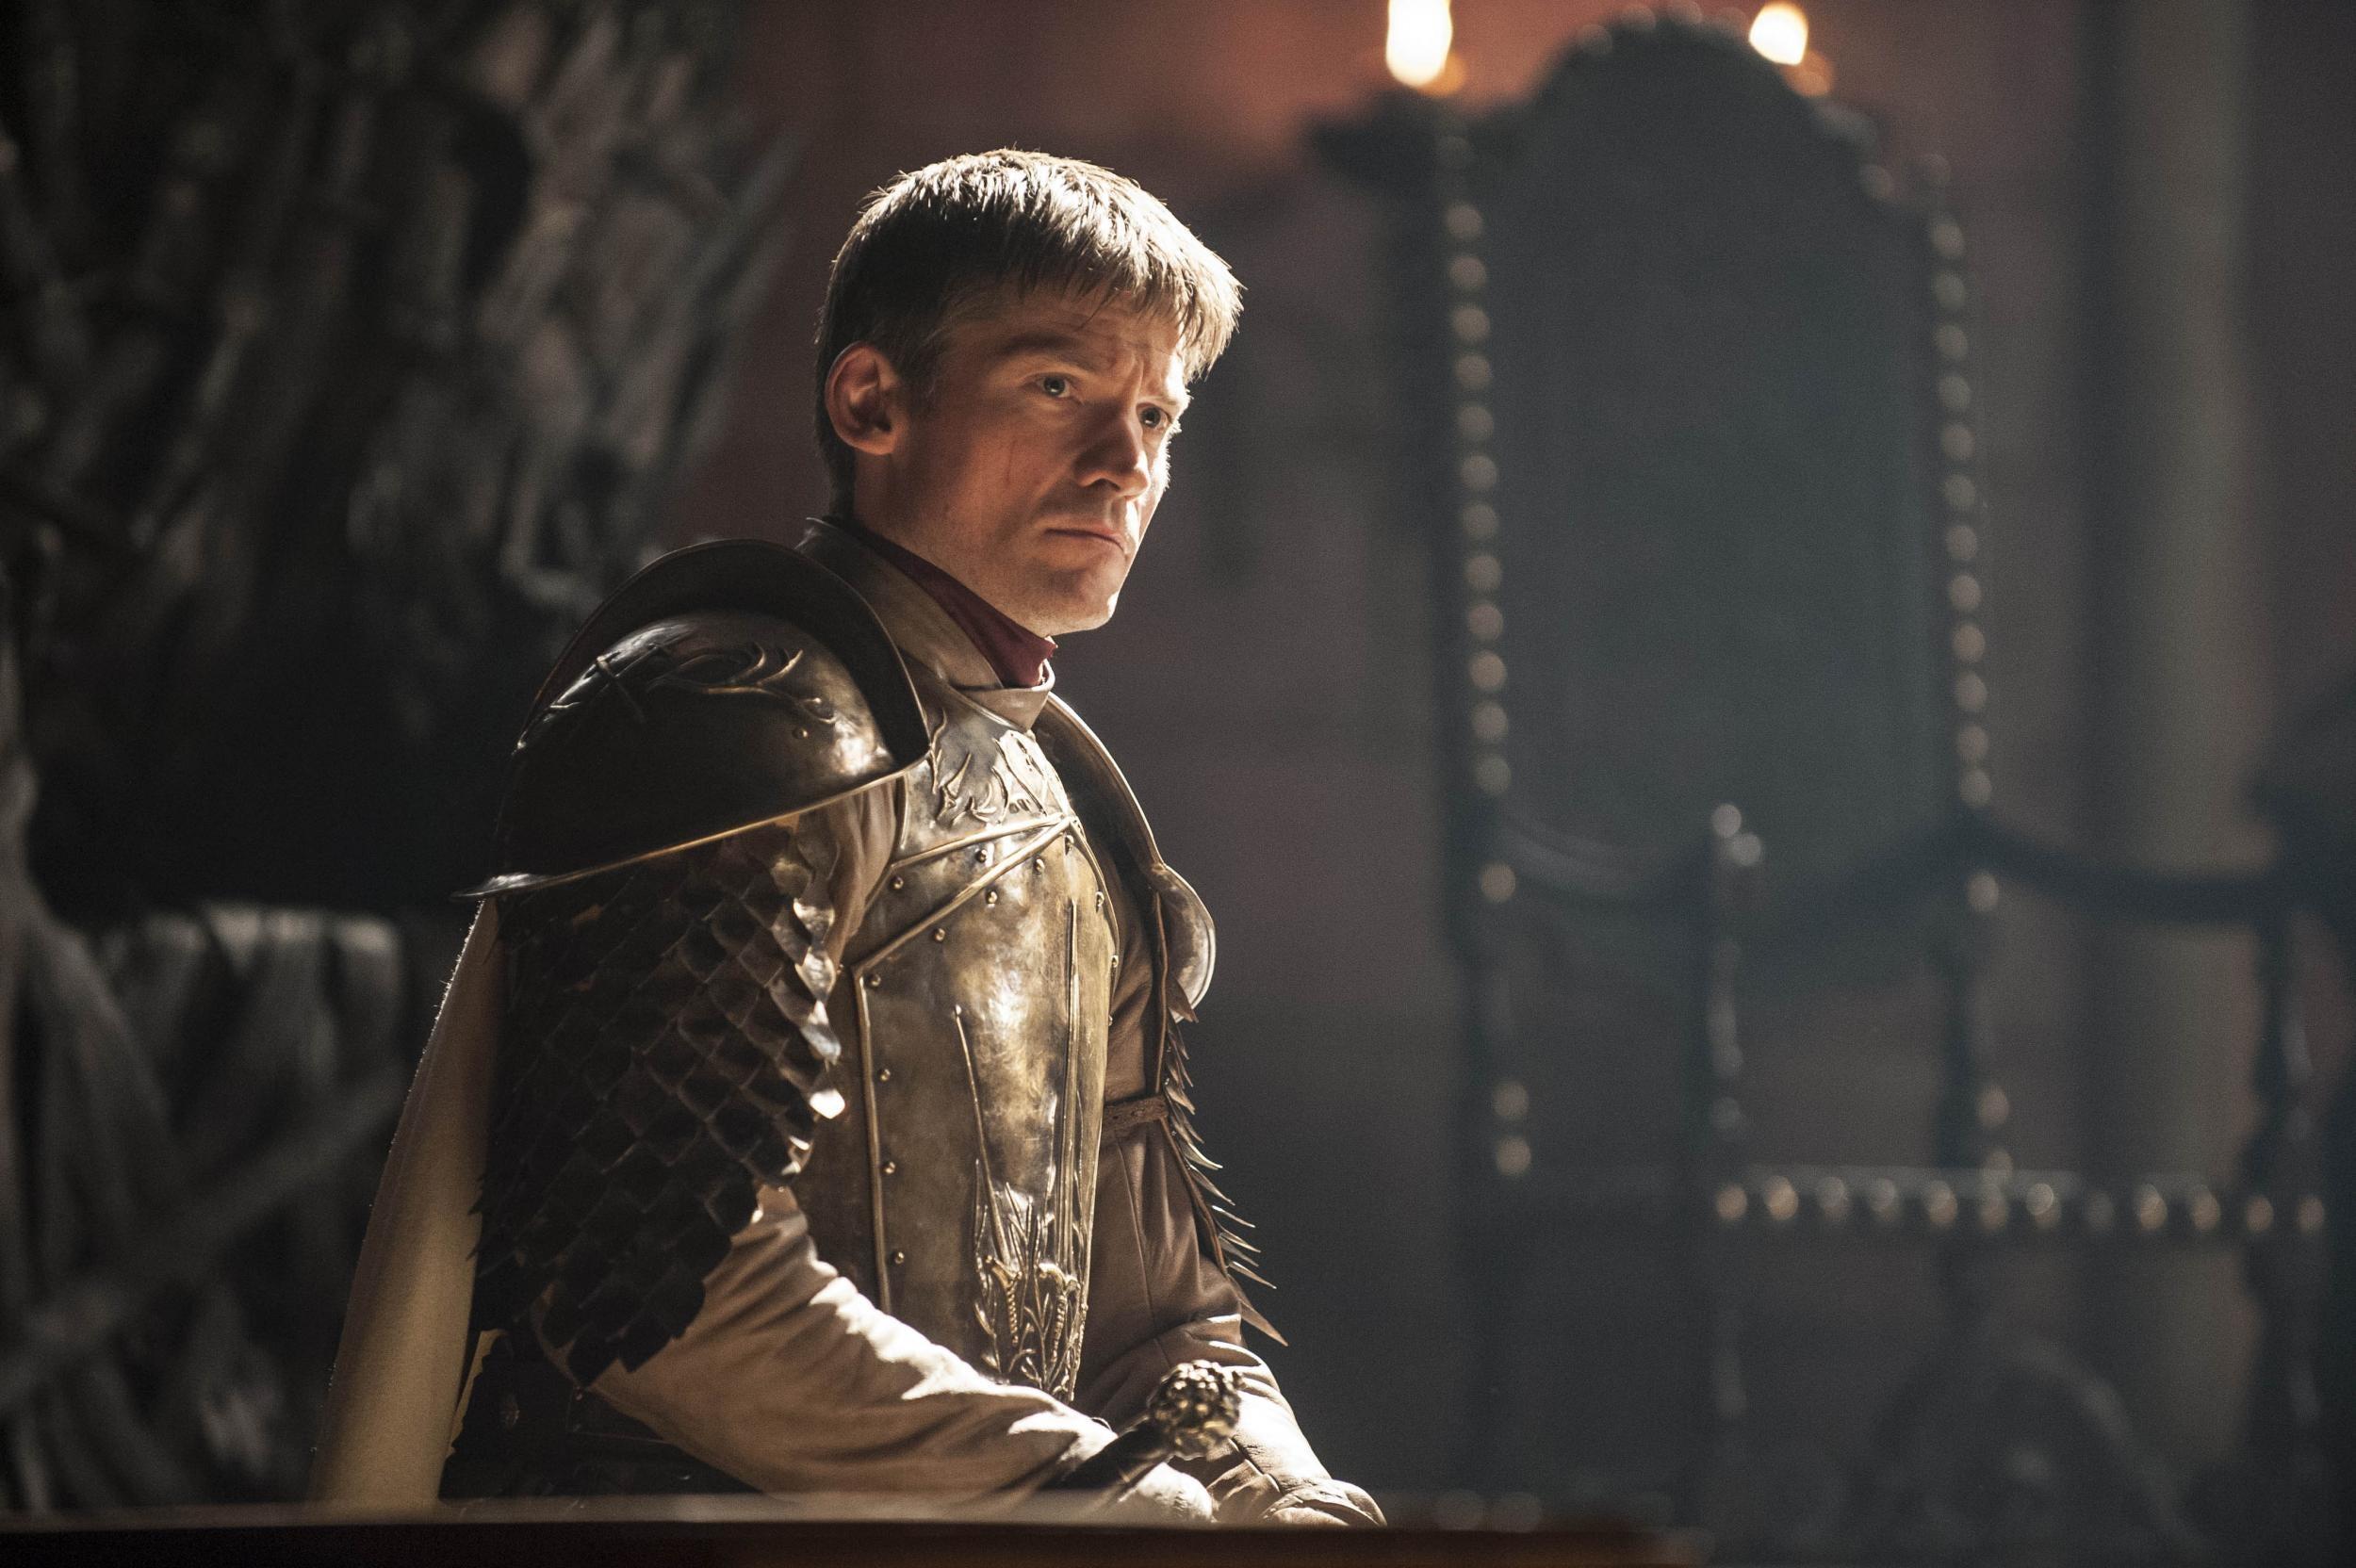 Znalezione obrazy dla zapytania jaime lannister season 6